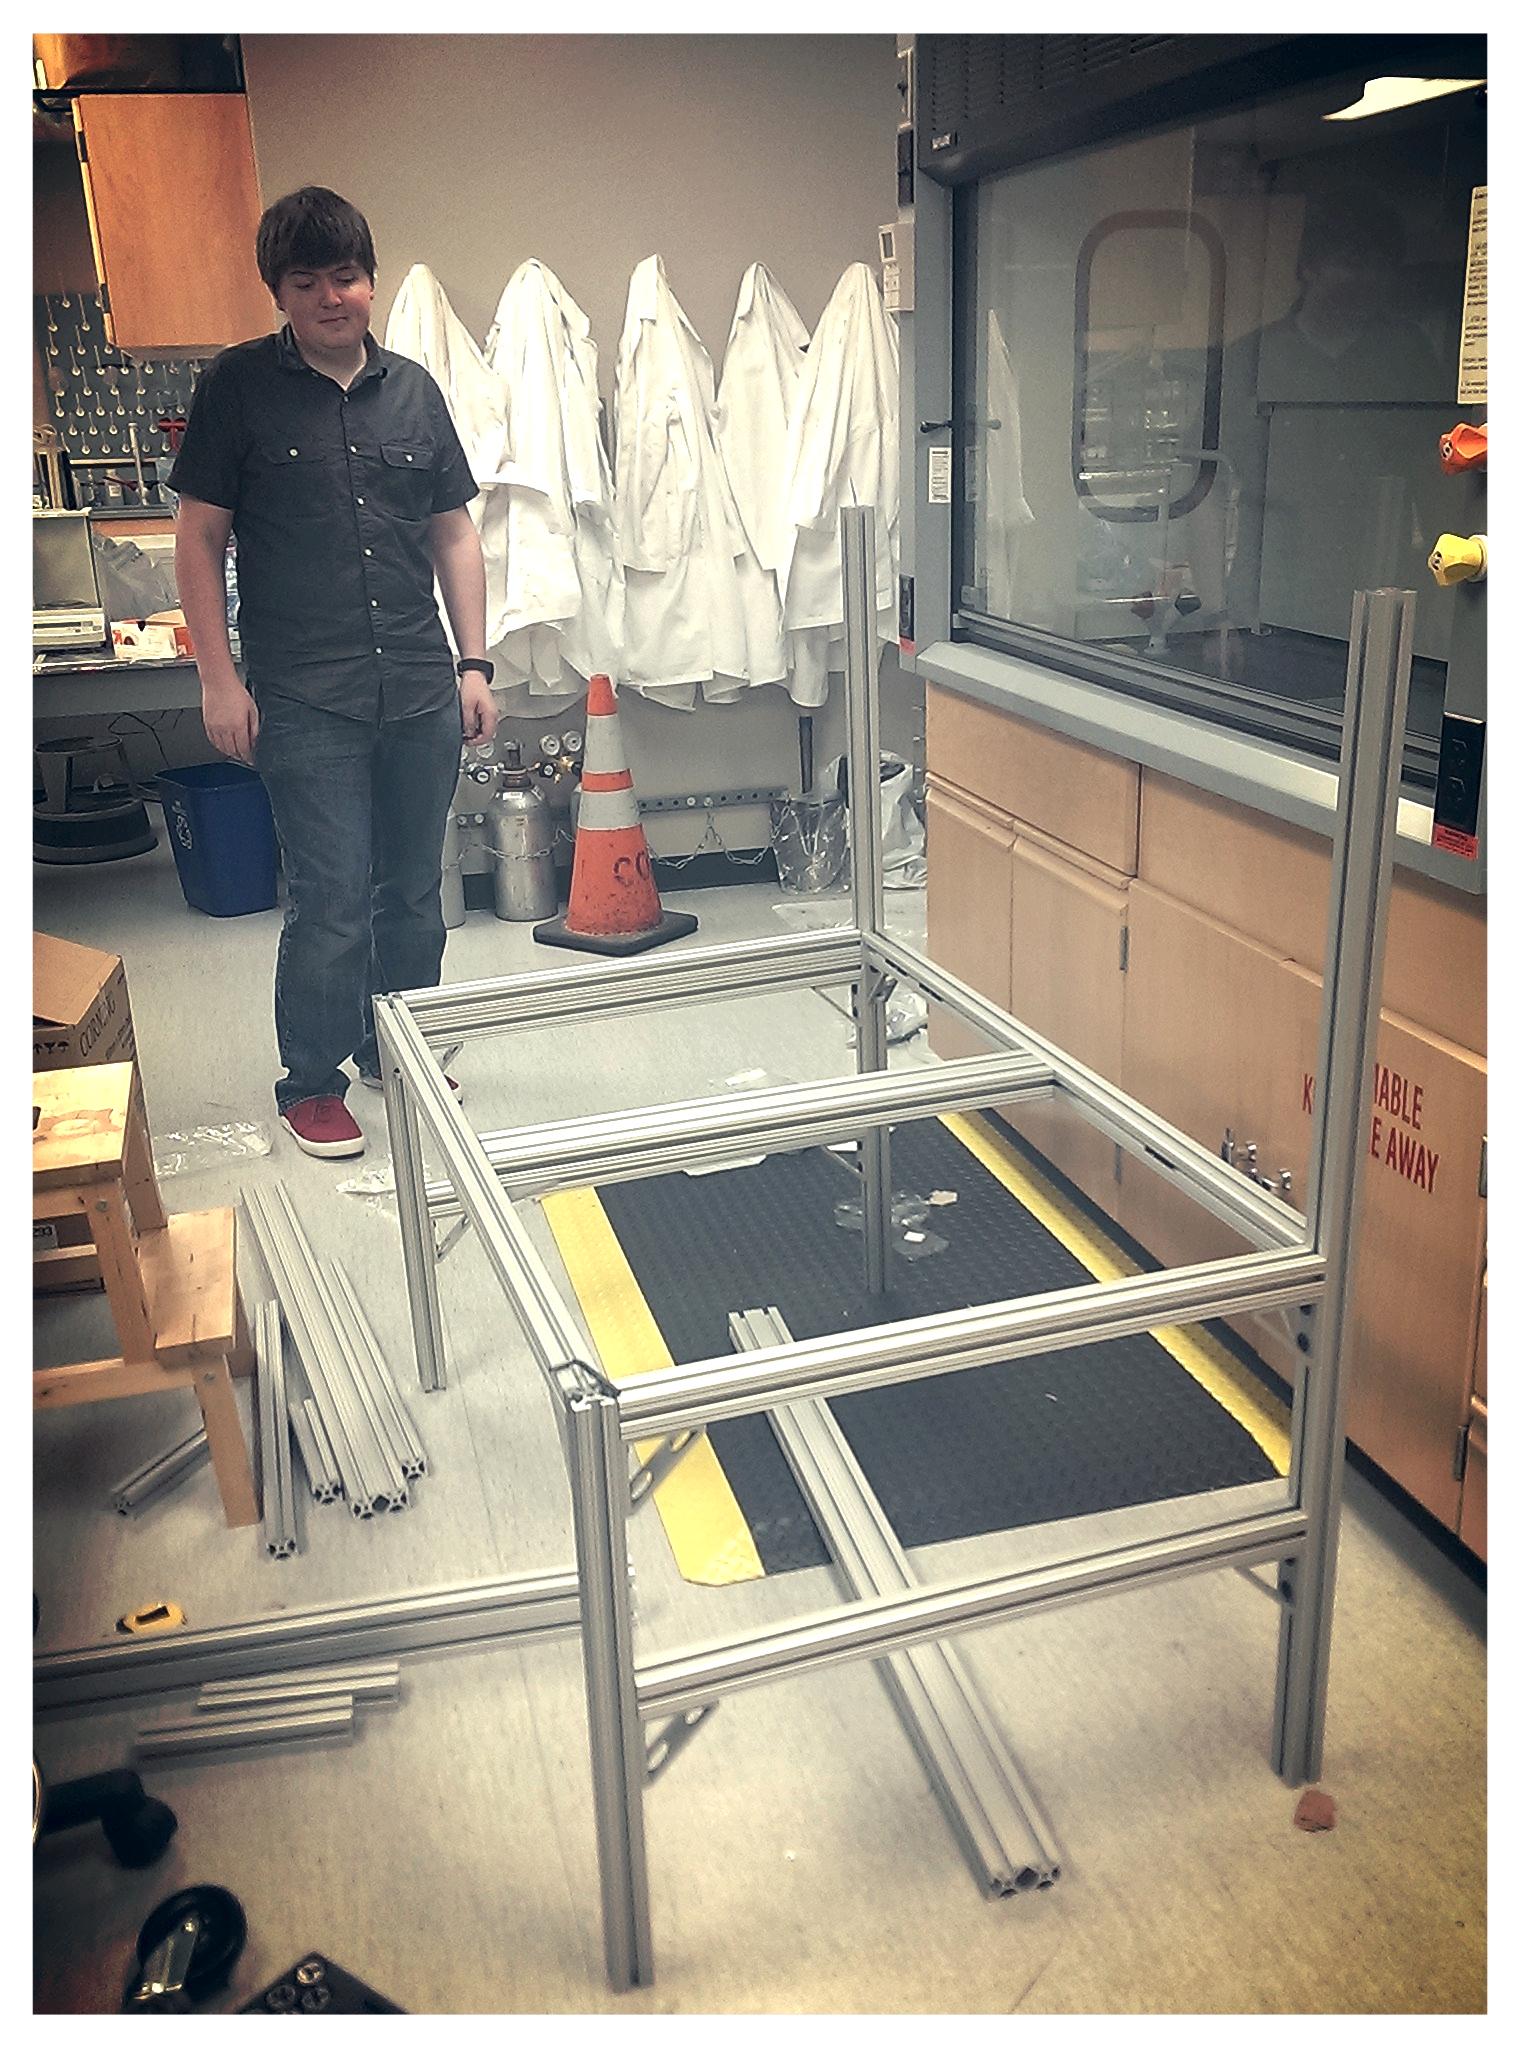 Ian admiring the sample prep cart-in-progress that he helped design.